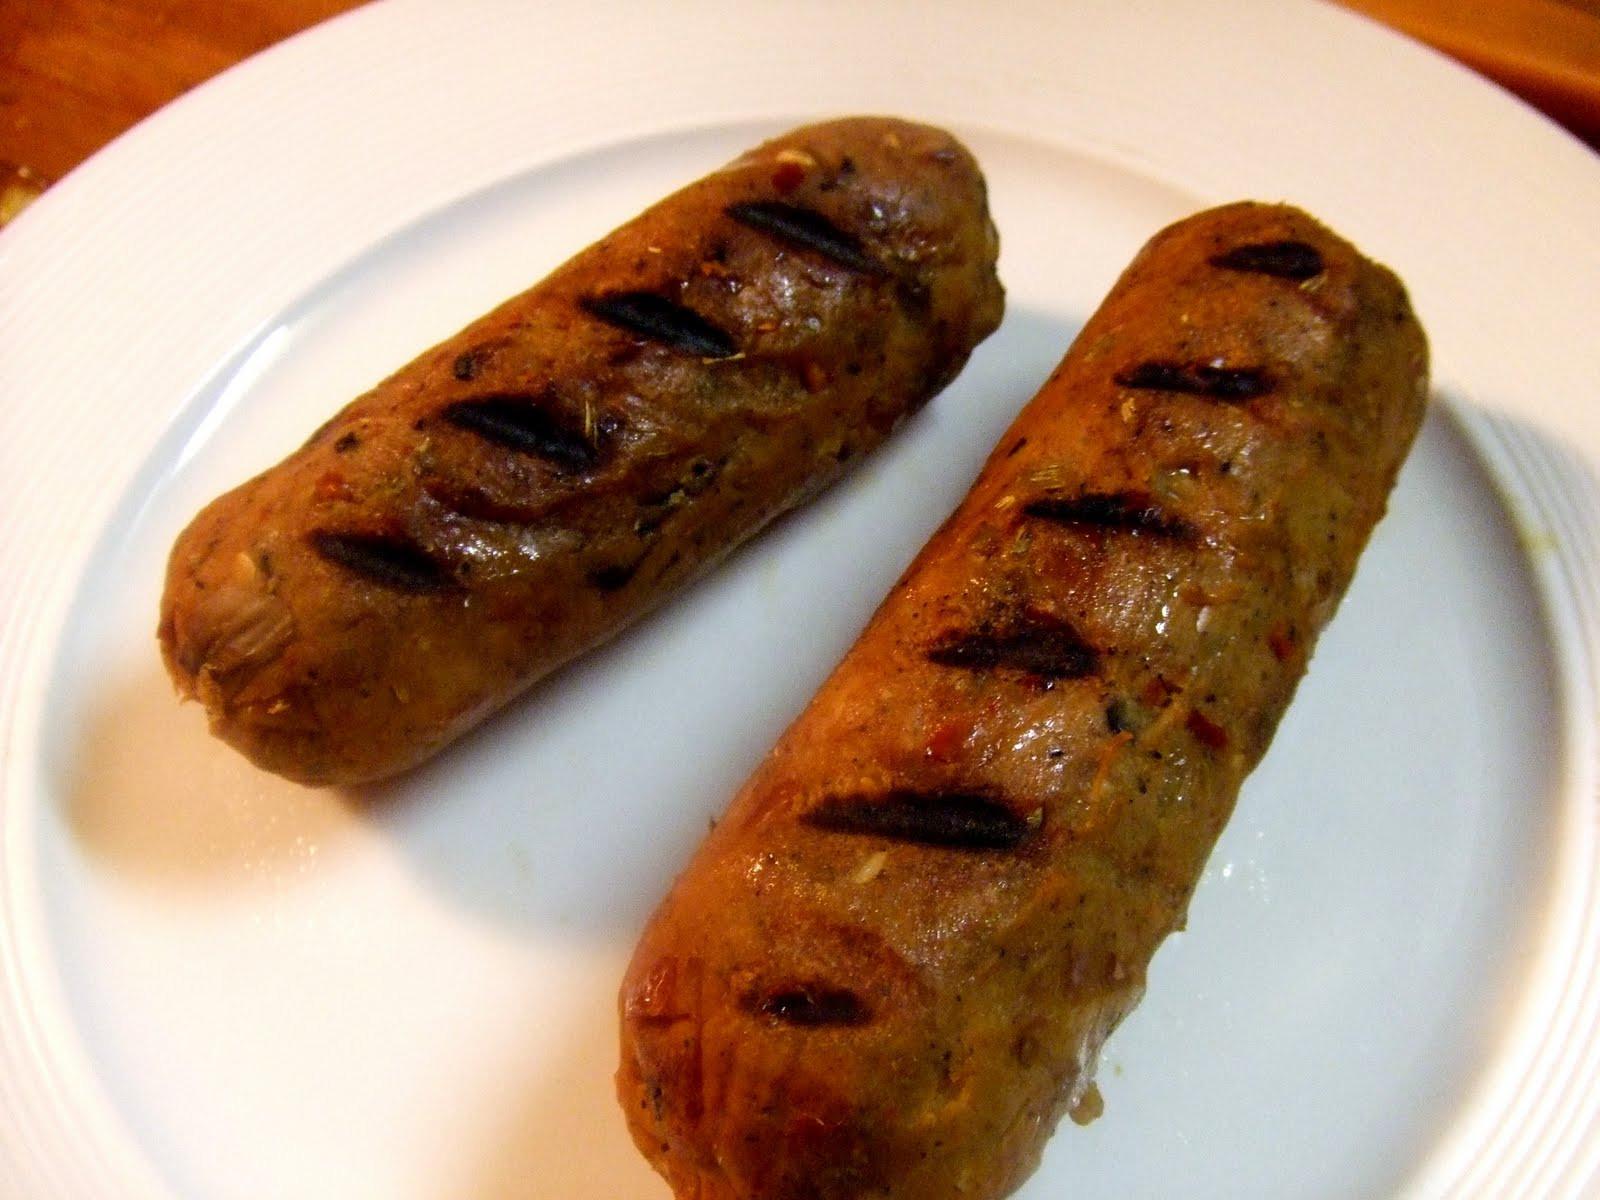 Vegan Sausage Recipes  Spicy Italian Sausage Vegan Soy Free and Gluten Free